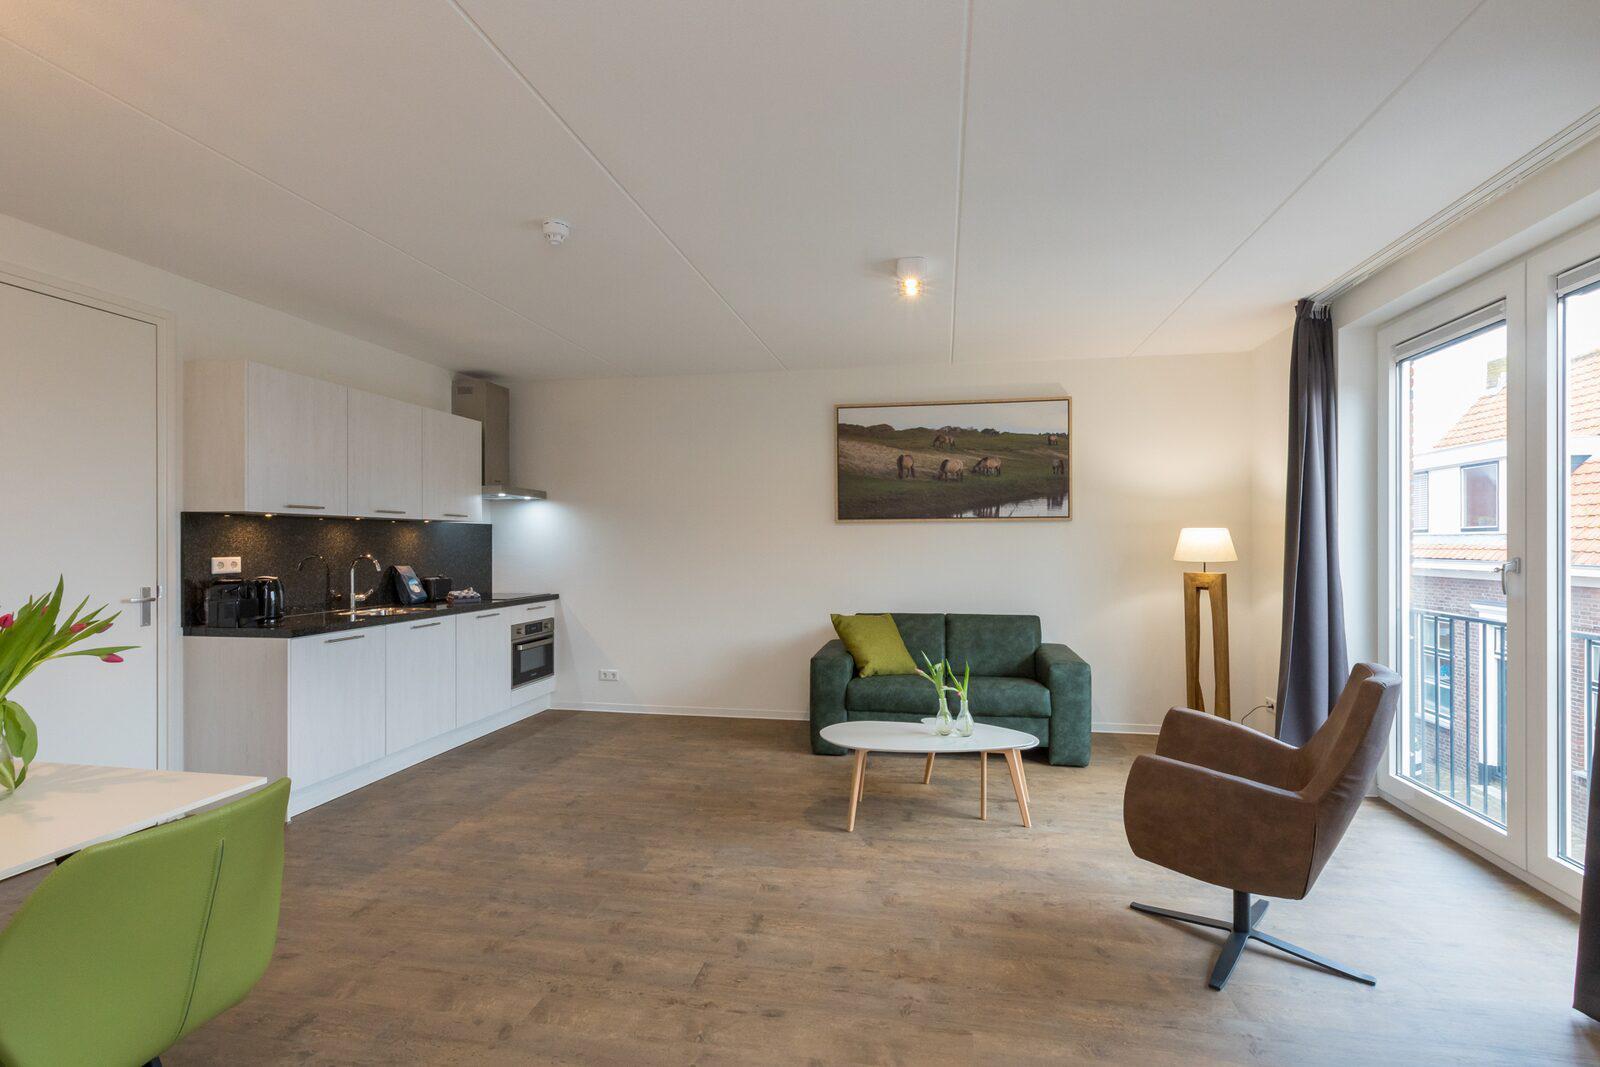 Aparthotel Zoutelanden Luxe appartement* 2 personen